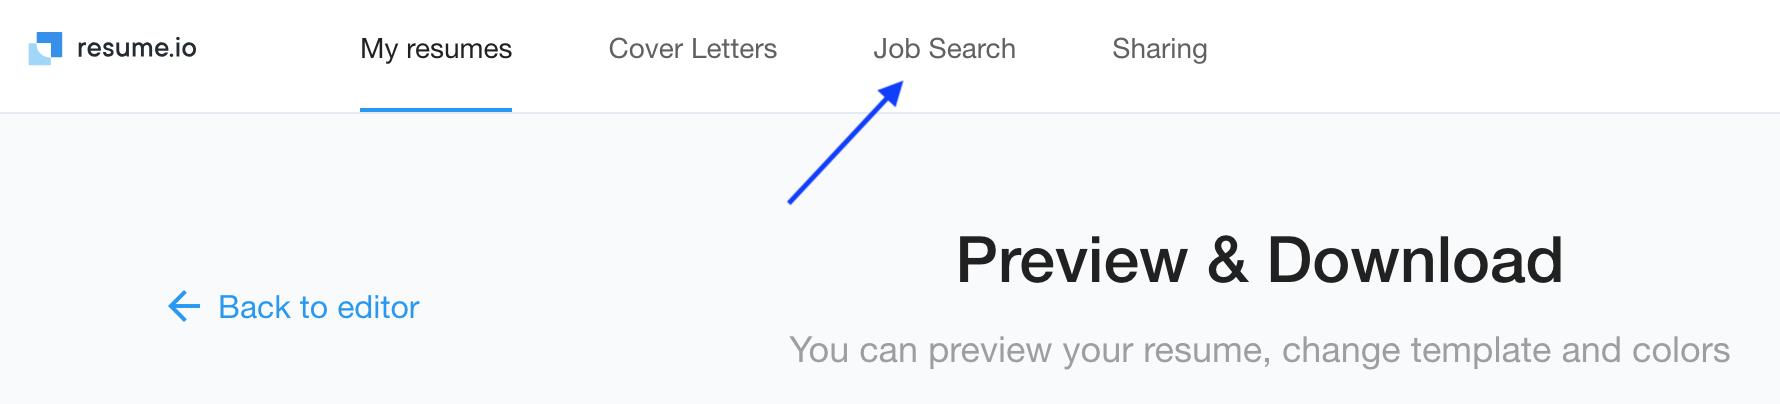 how do i search and apply to jobs on resume io resume io faq